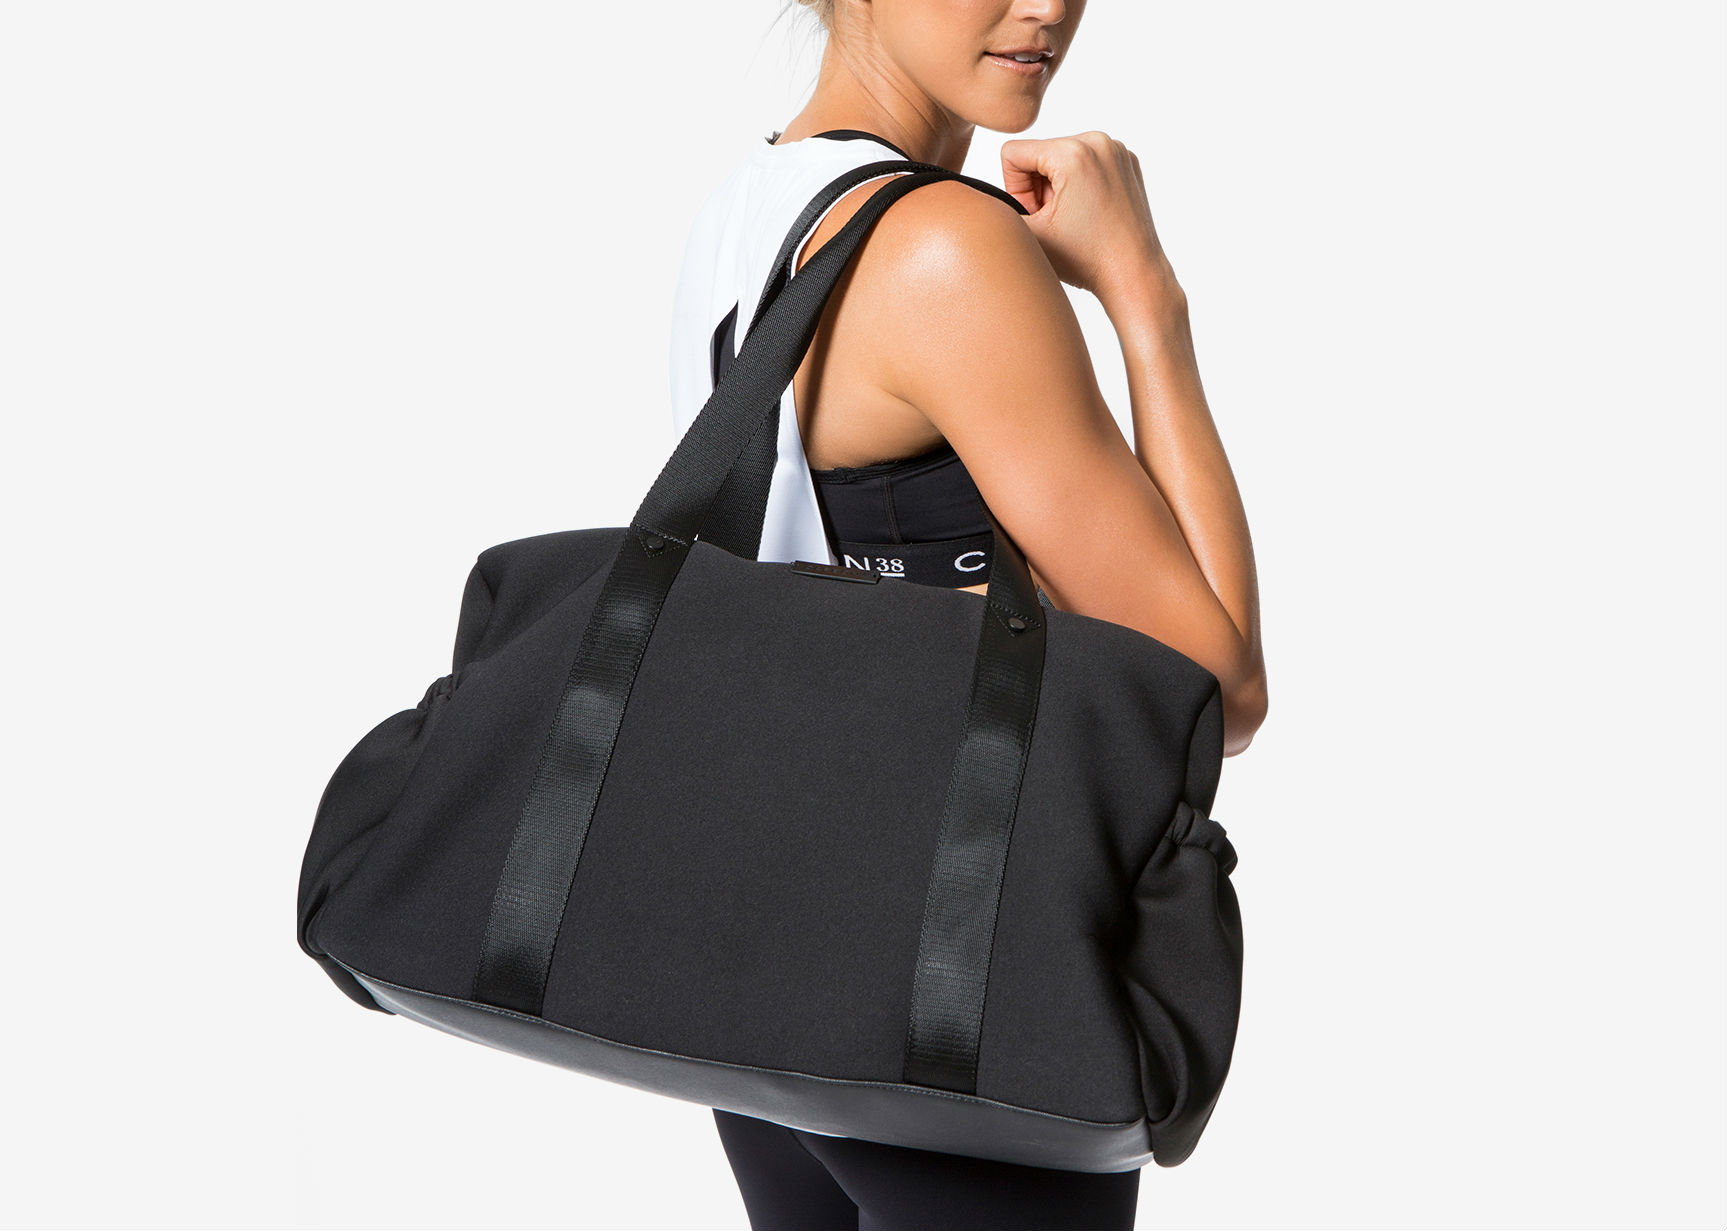 A model carrying a black gym bag